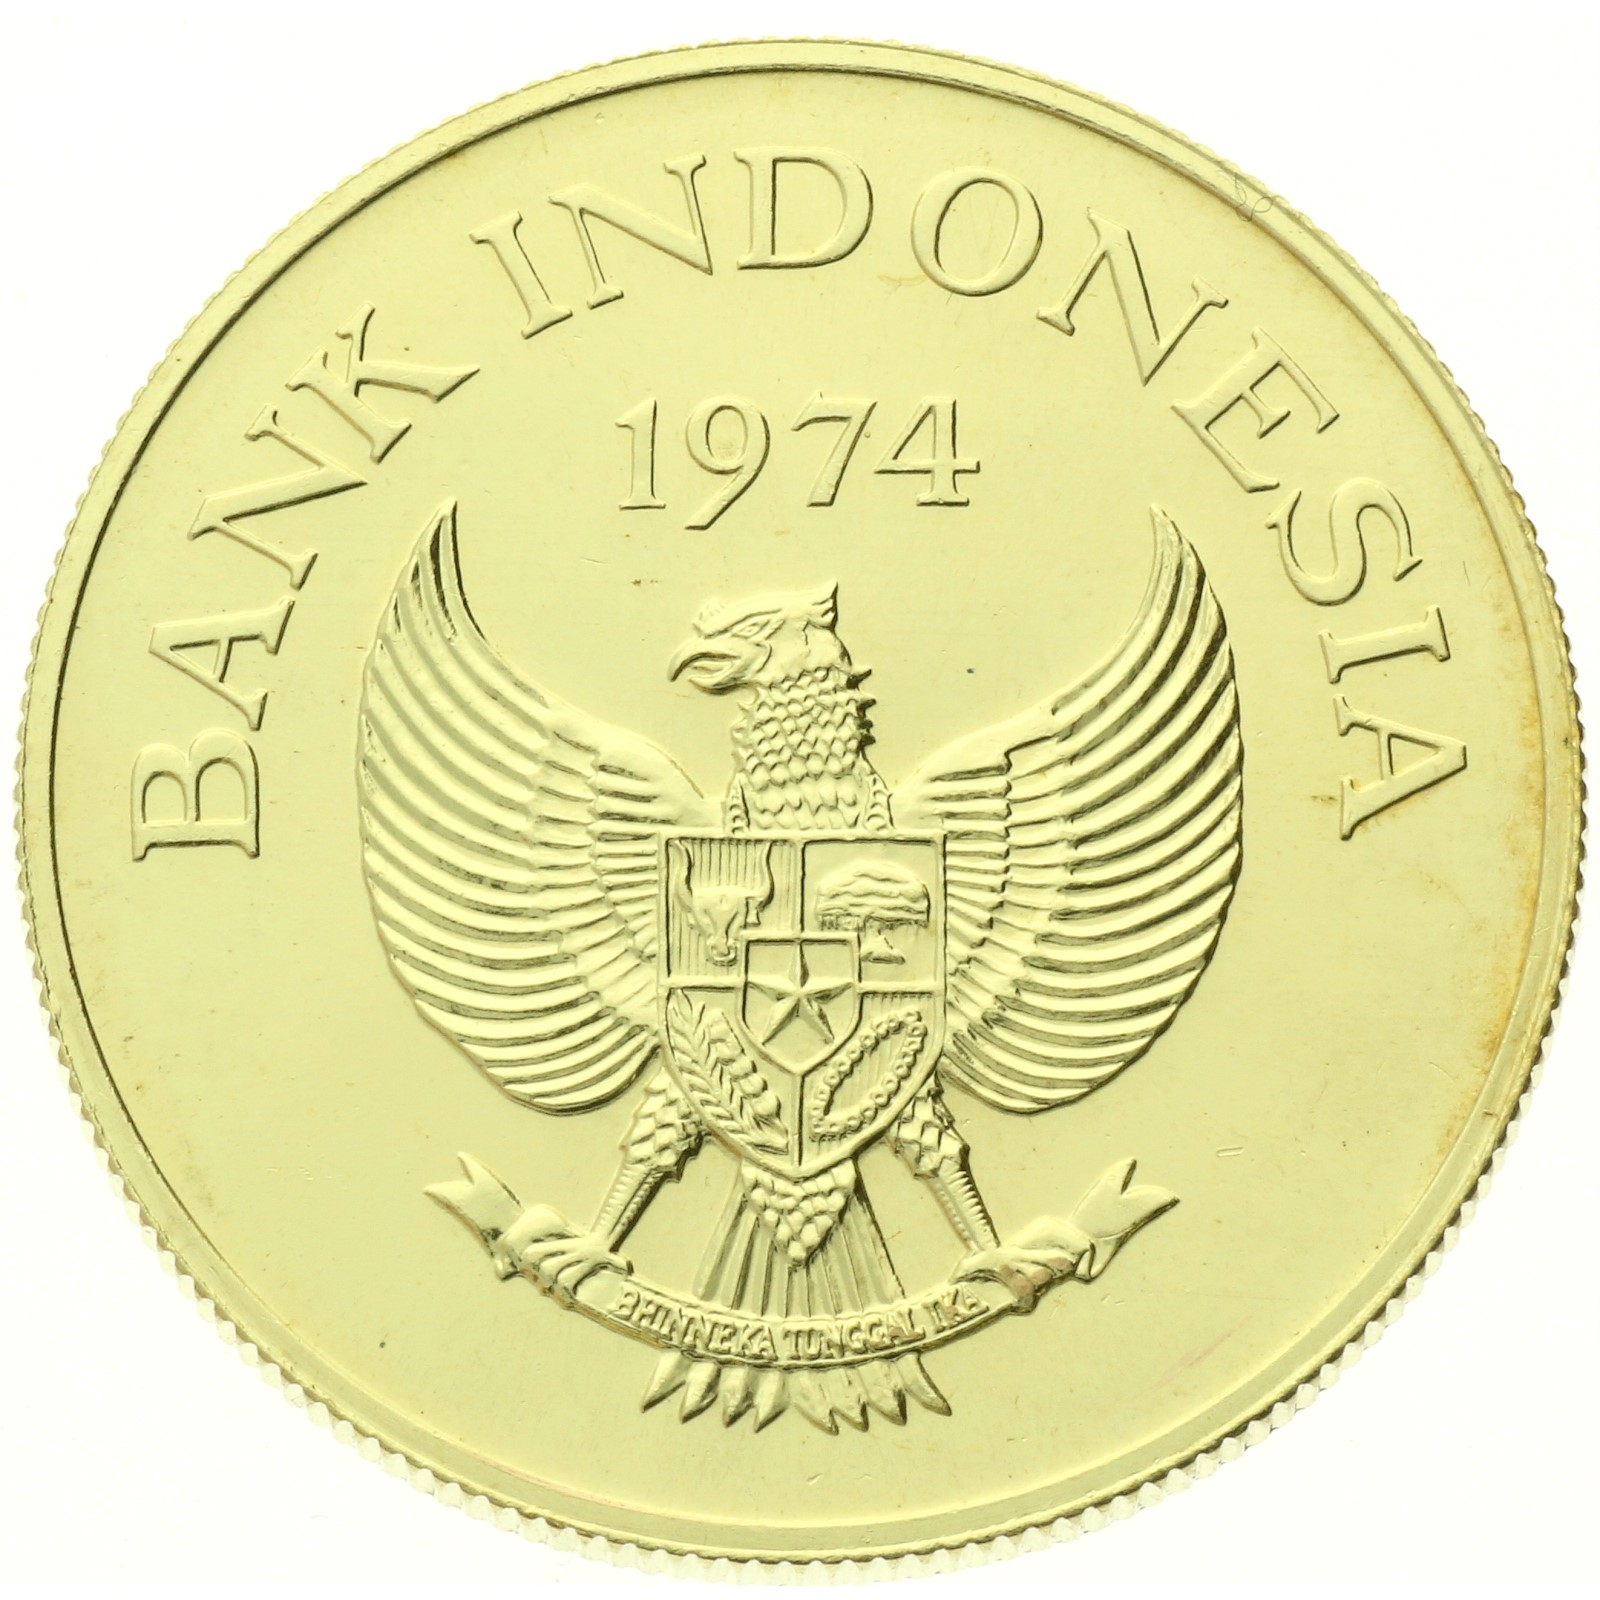 Indonesia - 100000 rupiah - 1974 - Komodo Dragon